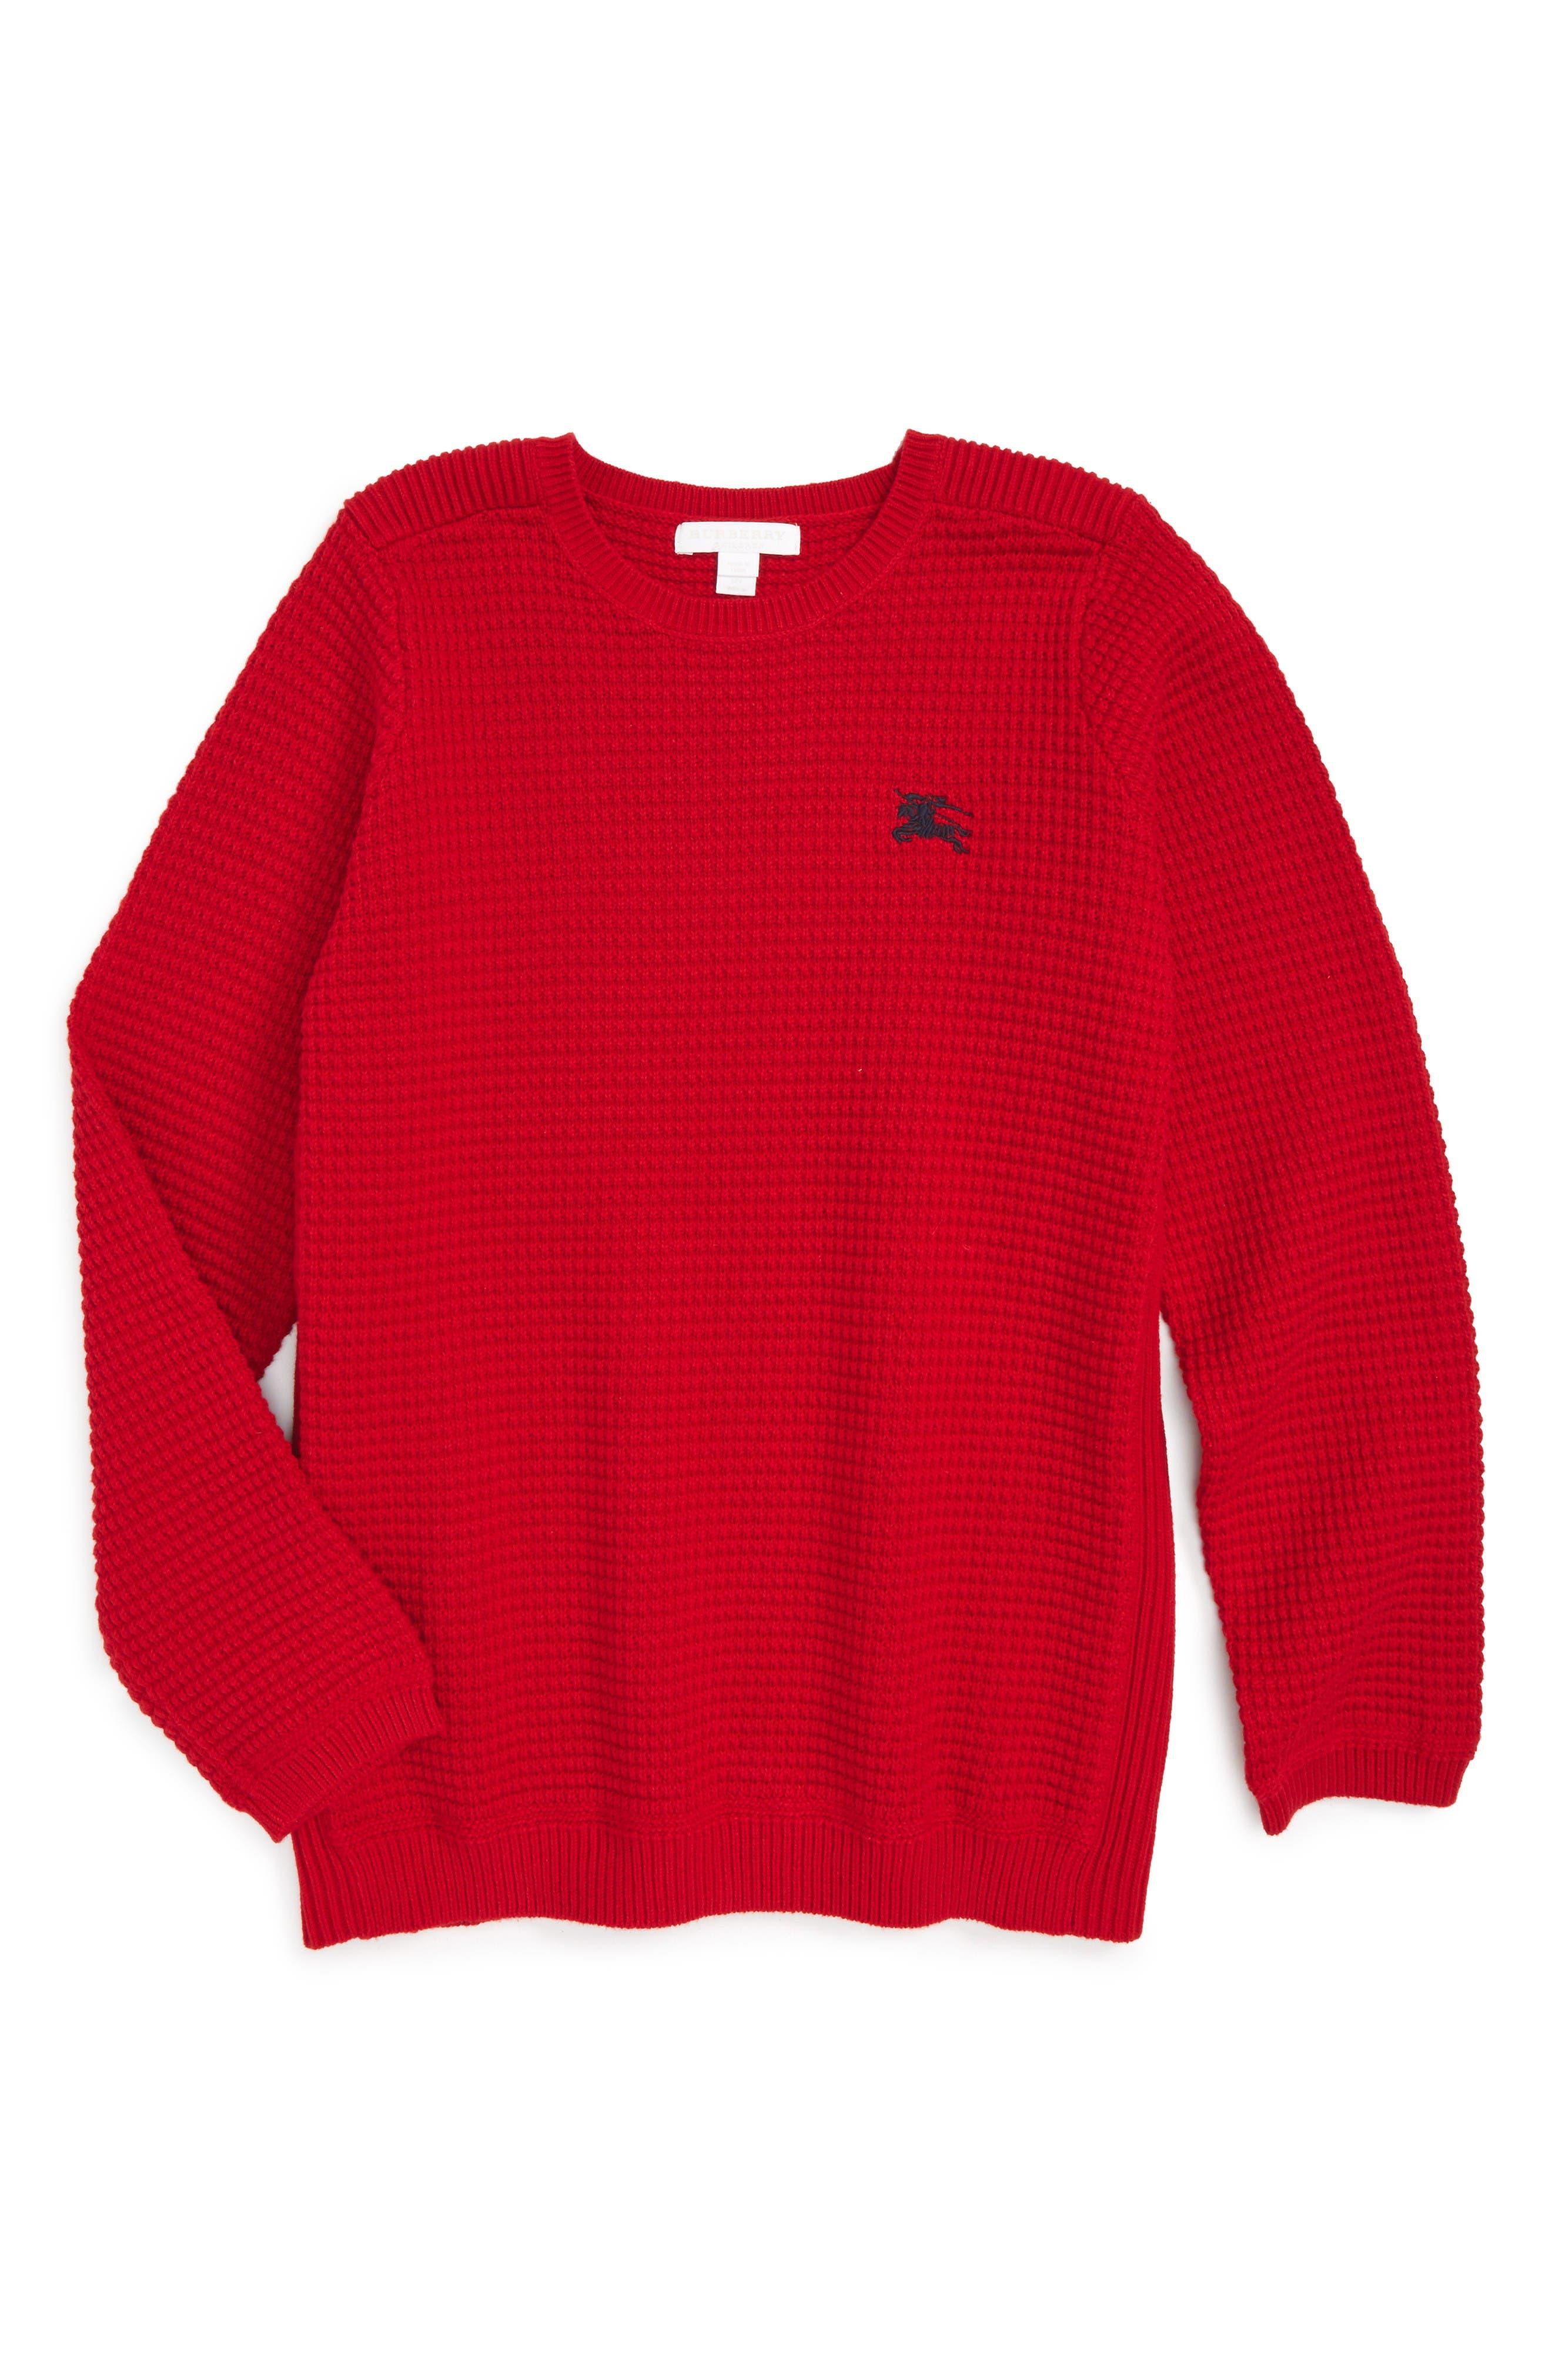 Burberry Eddy Sweater (Little Boys & Big Boys)